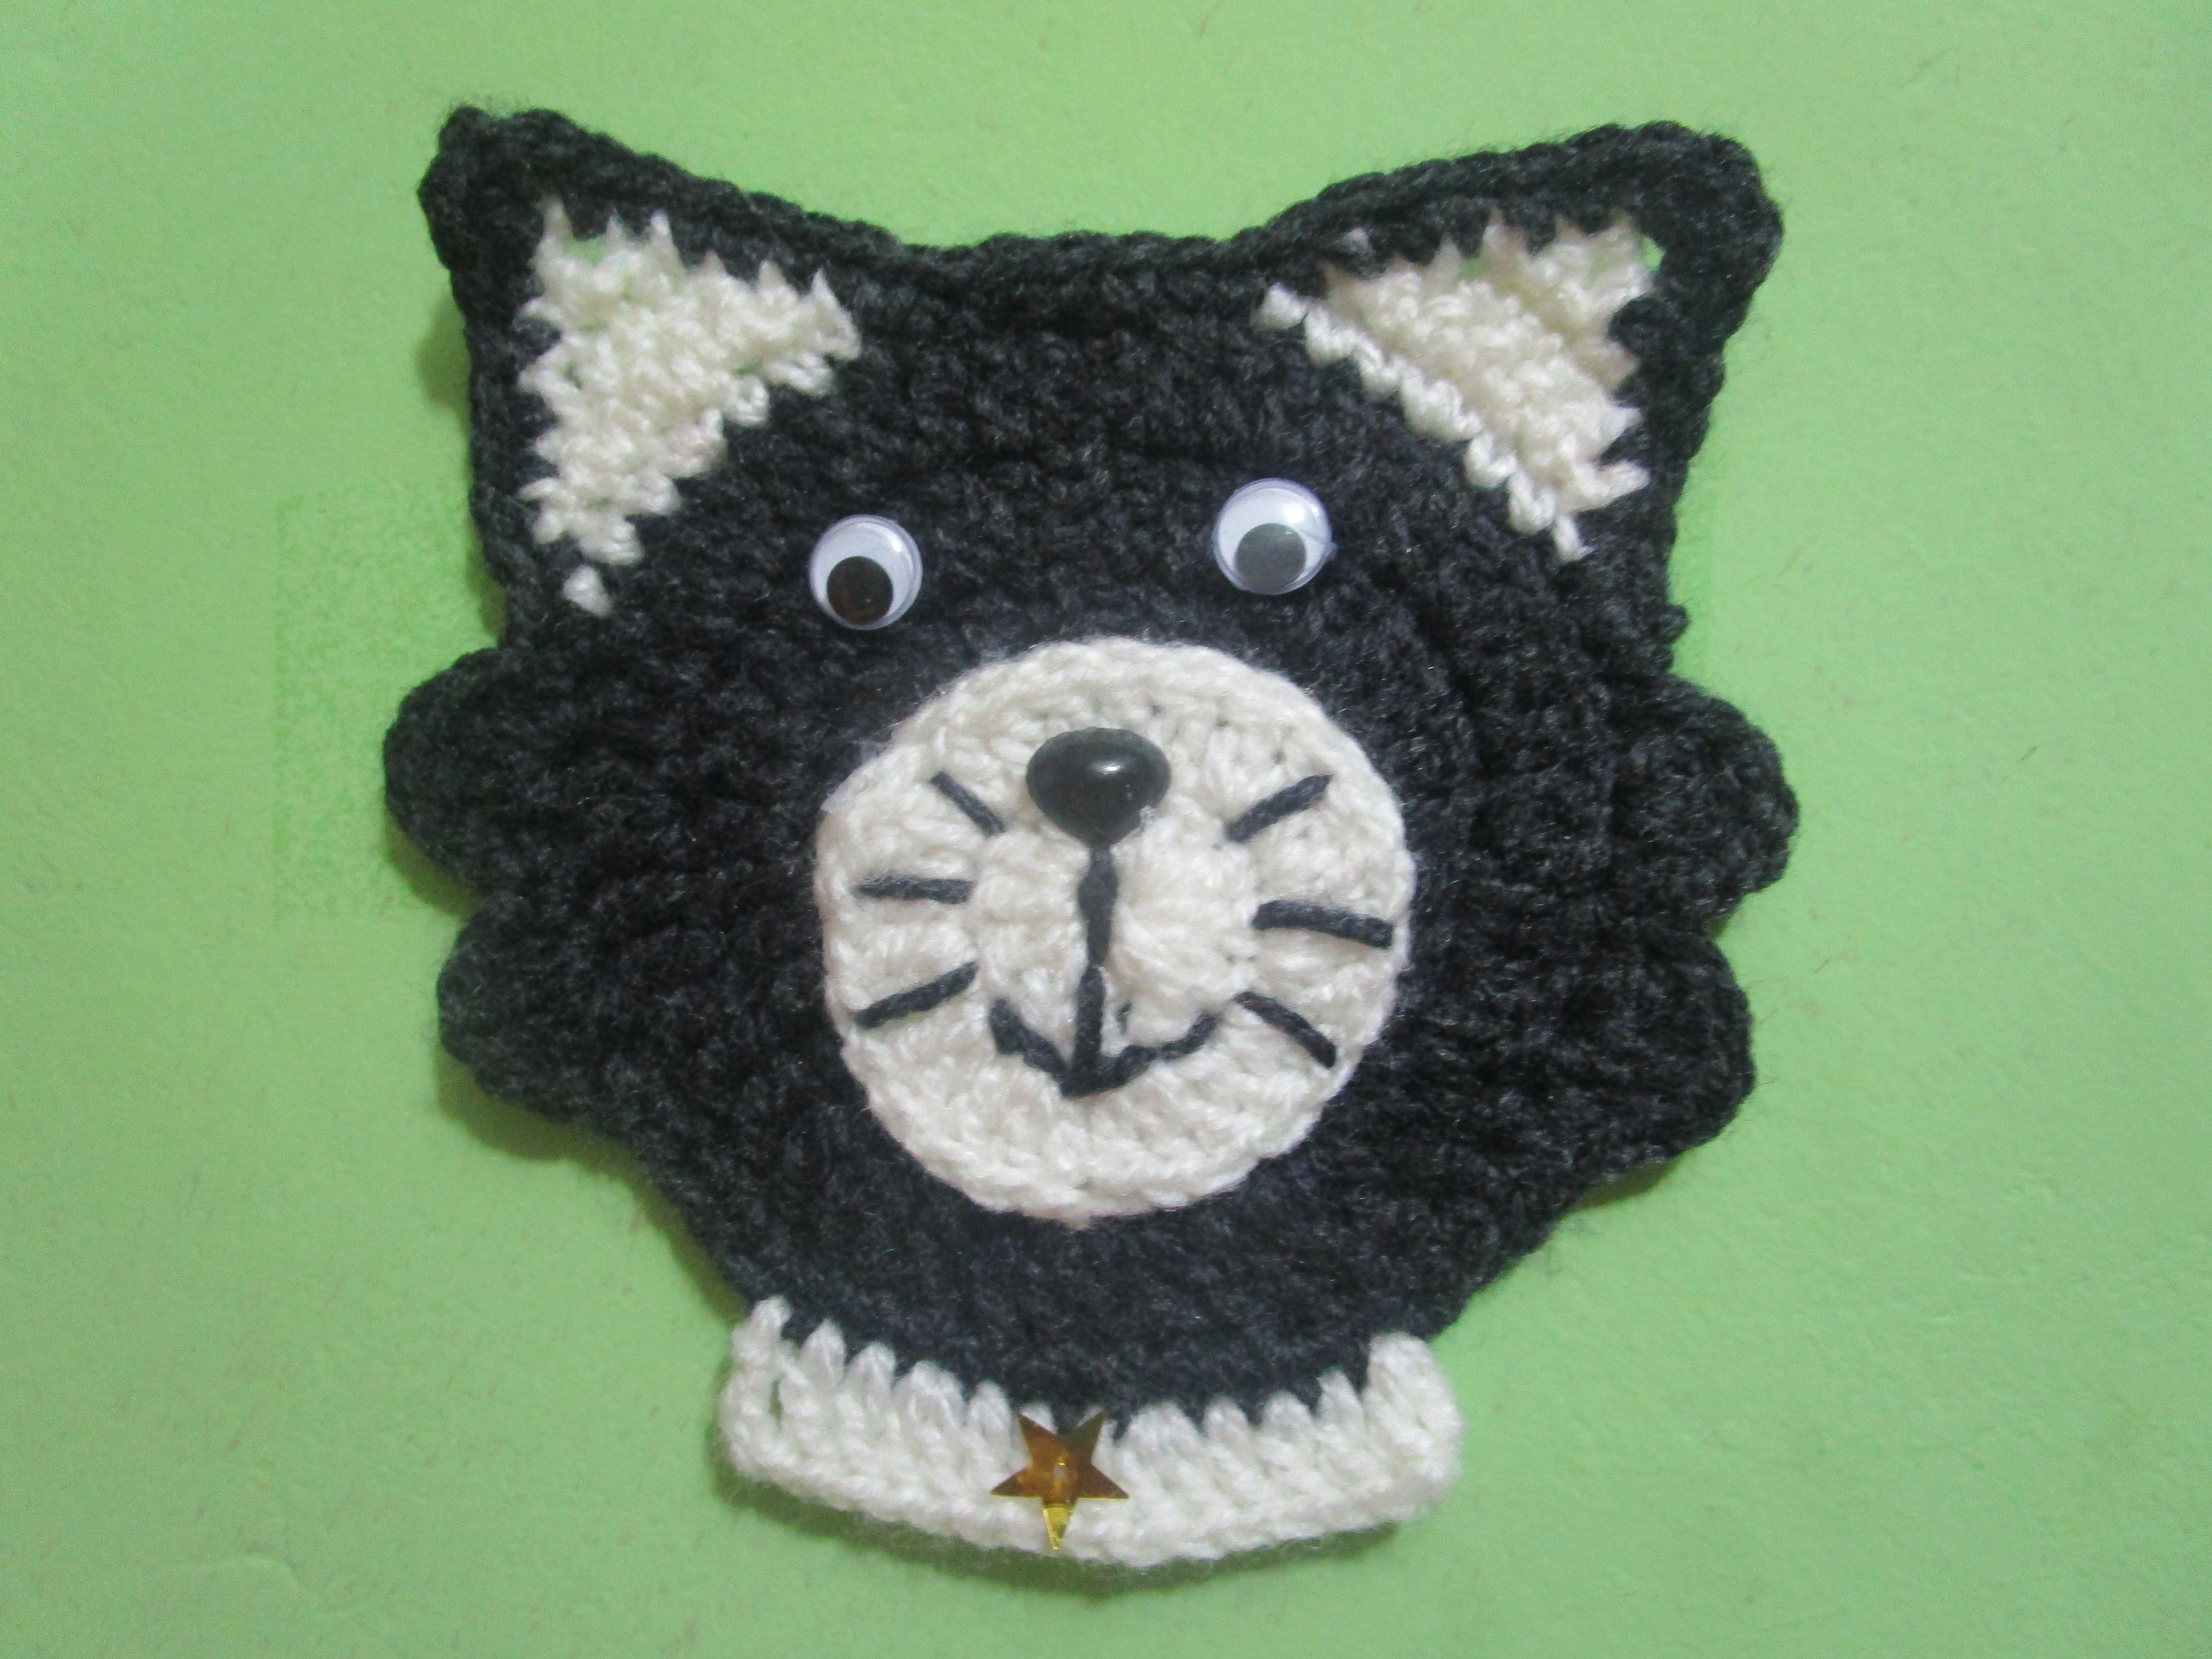 Carita De Gatito Tejido a Crochet - APLICATIVO | APLICACIONES ...